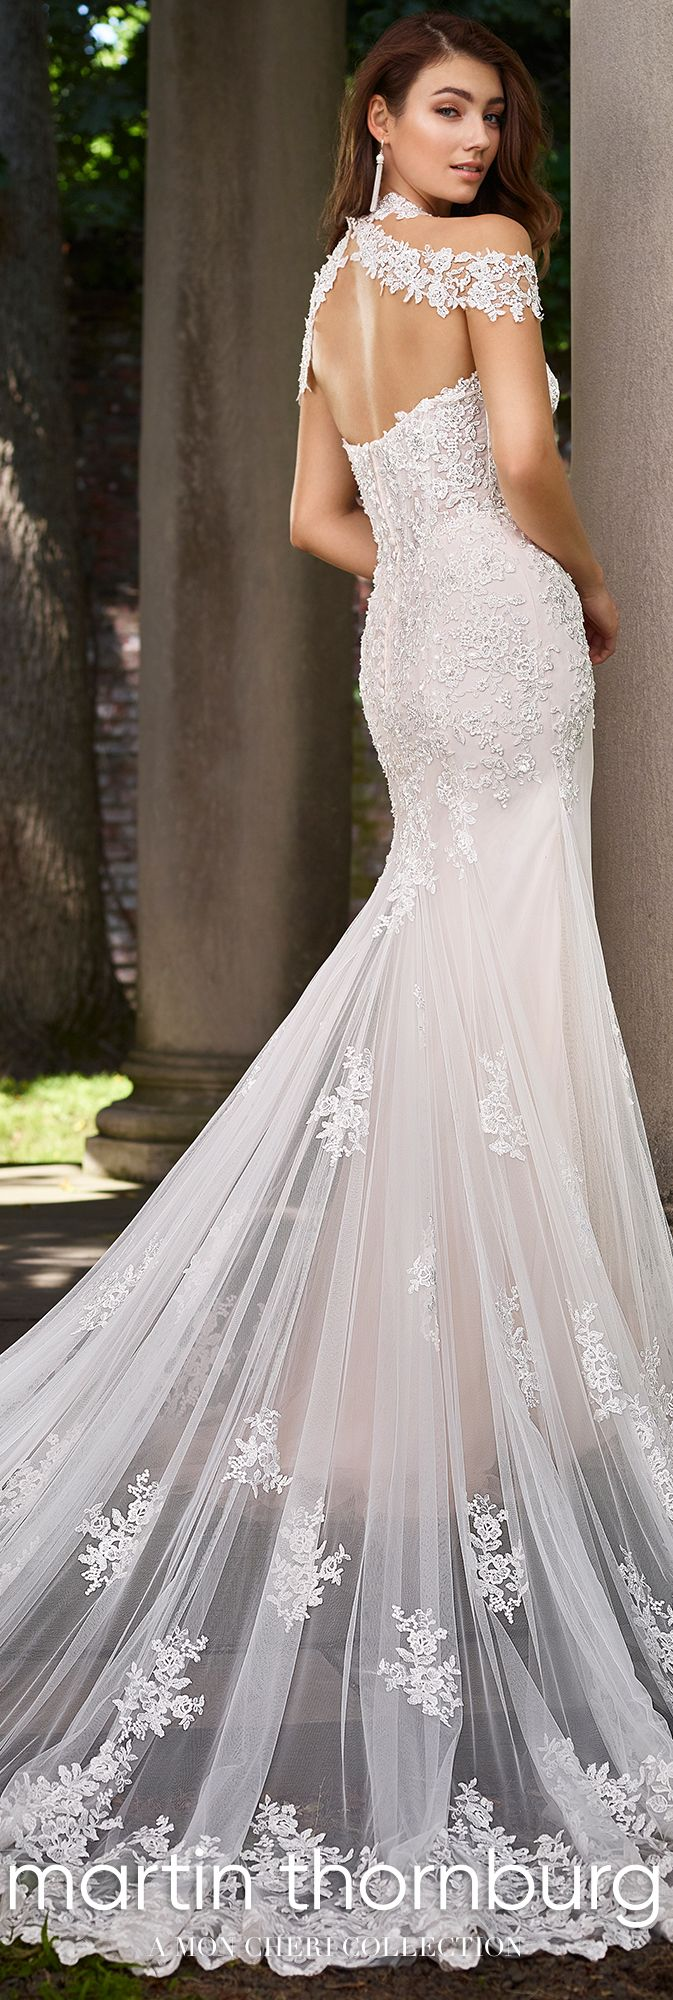 june in wedding dresses pinterest wedding dresses